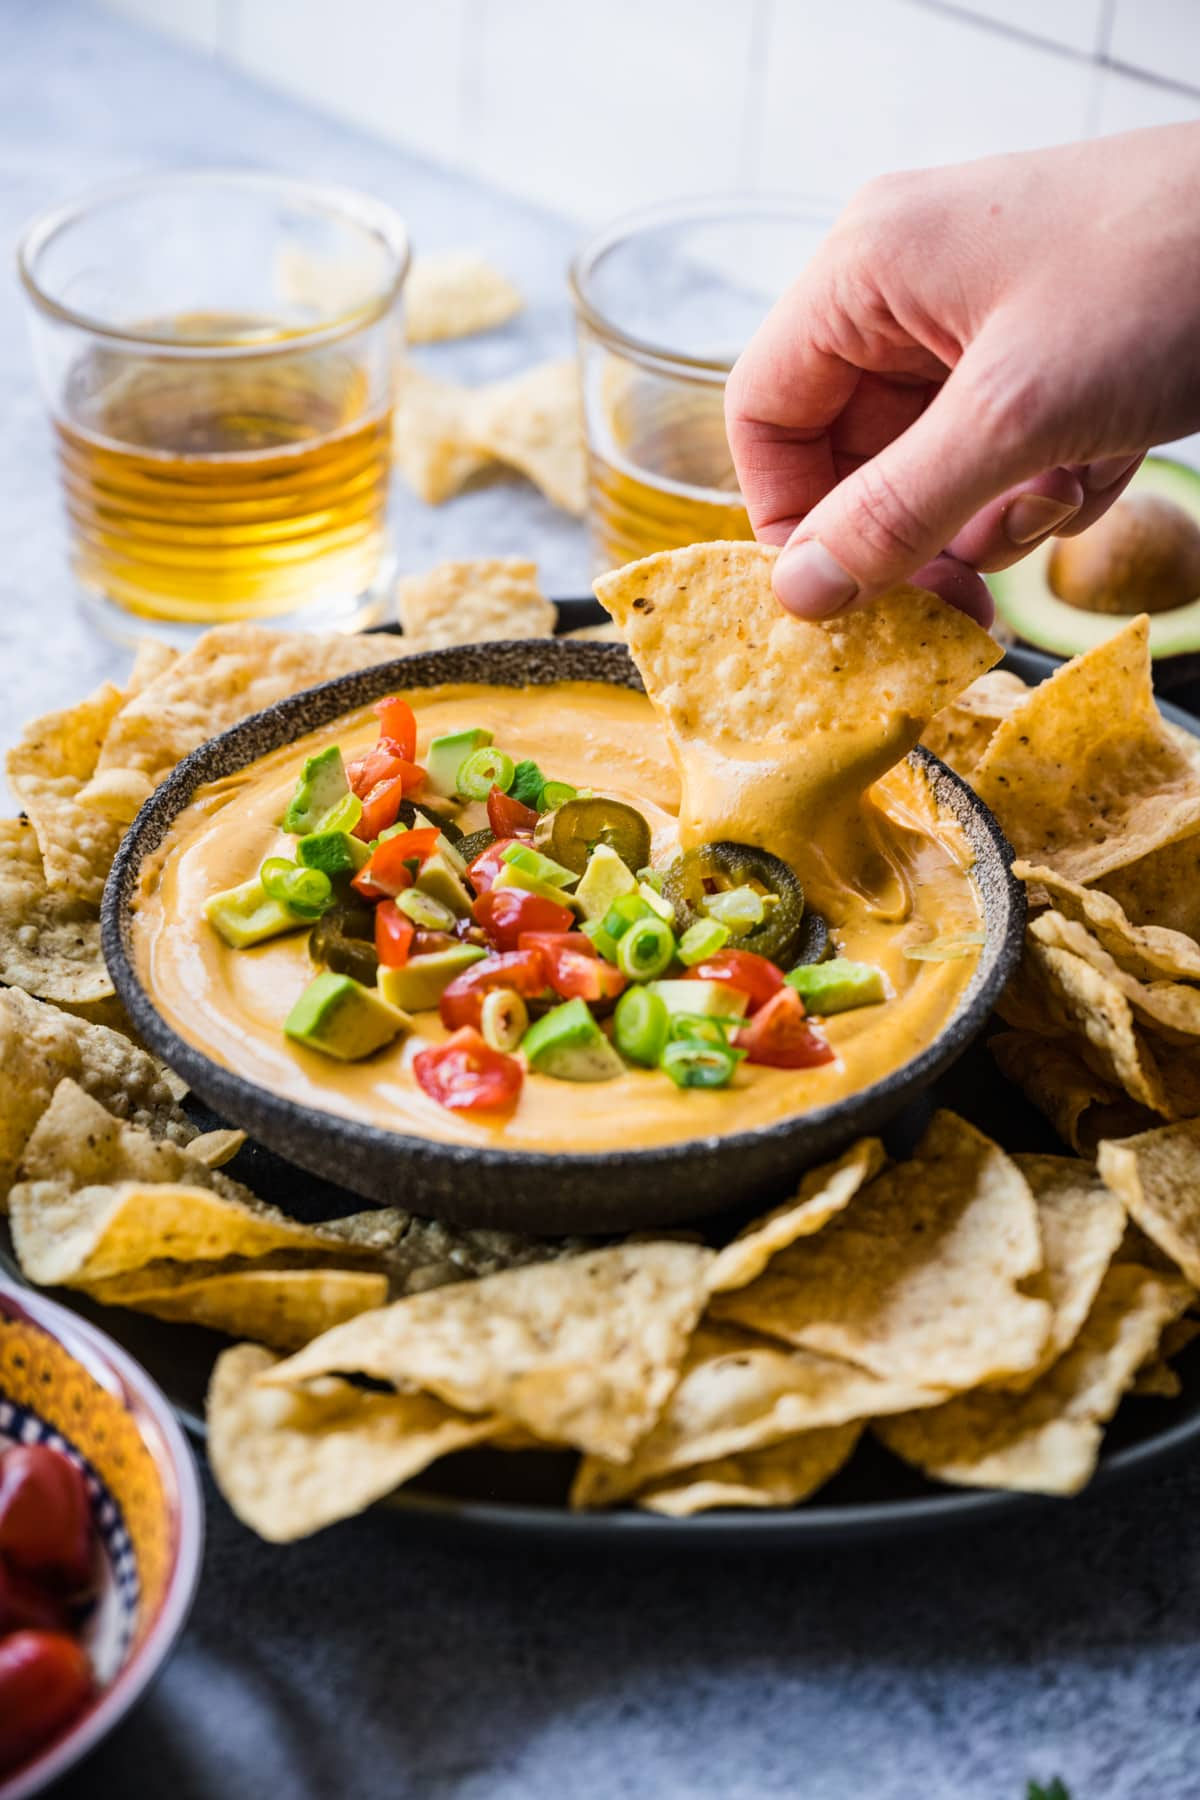 person dipping tortilla chip into vegan queso dip.